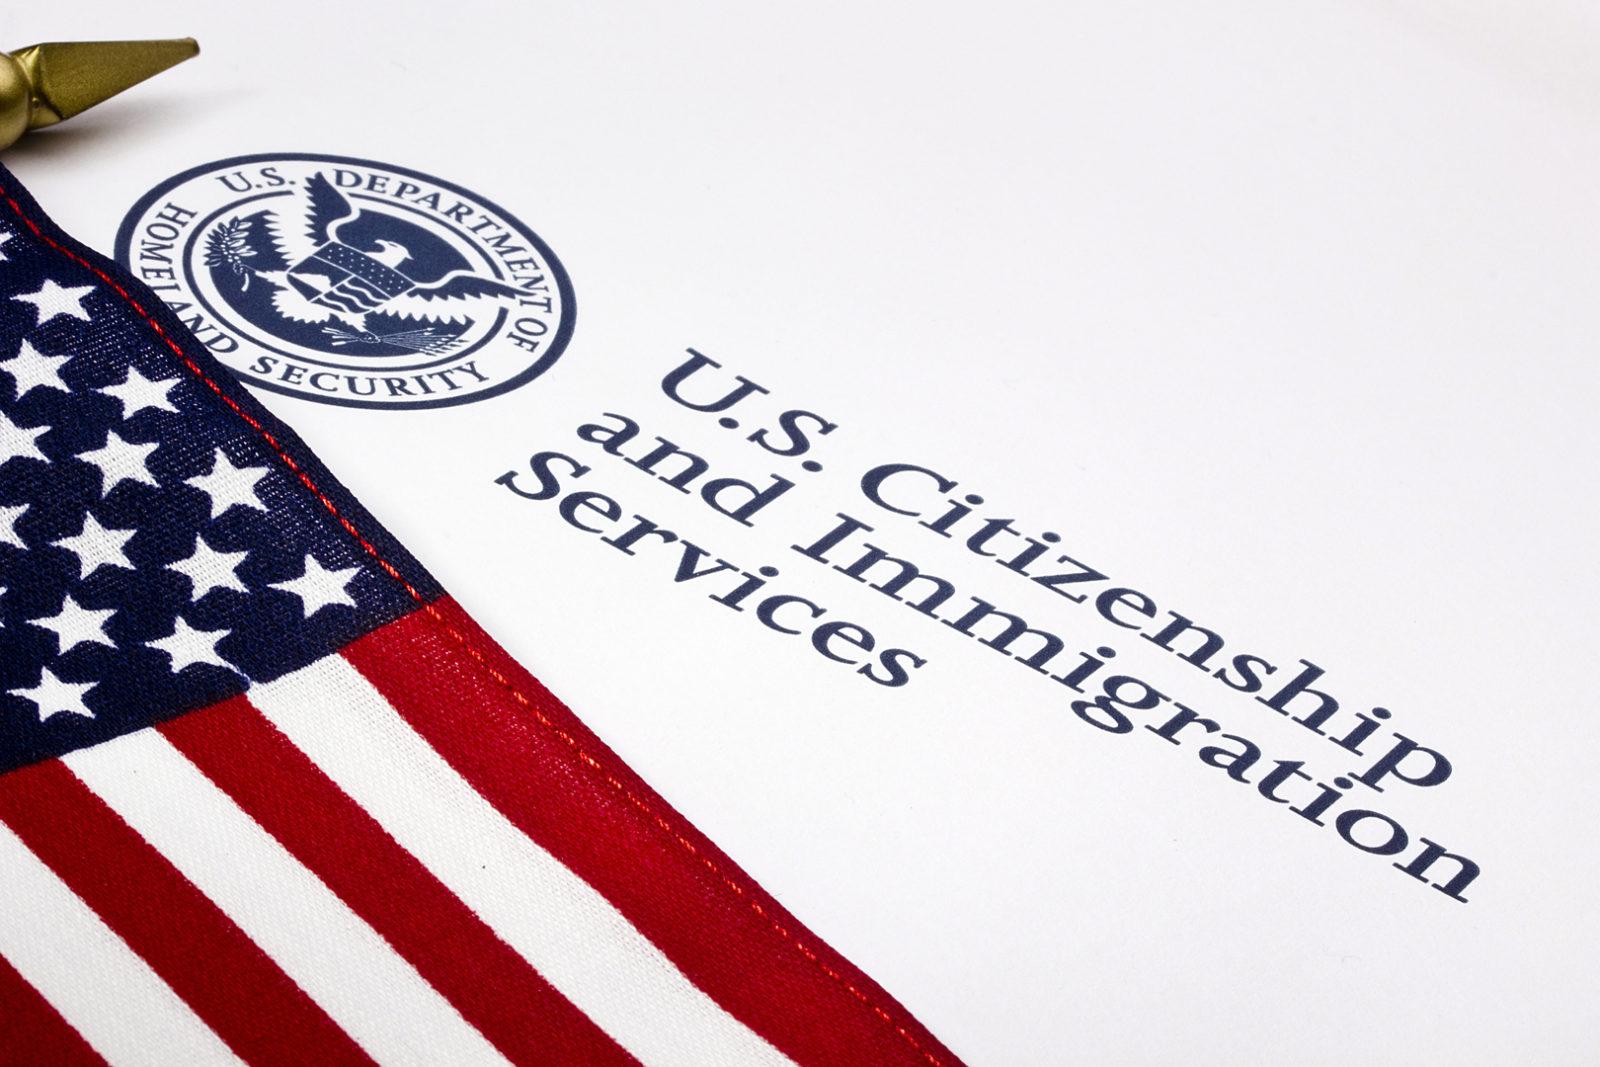 Immigration Legal Services | Migration Resource Center